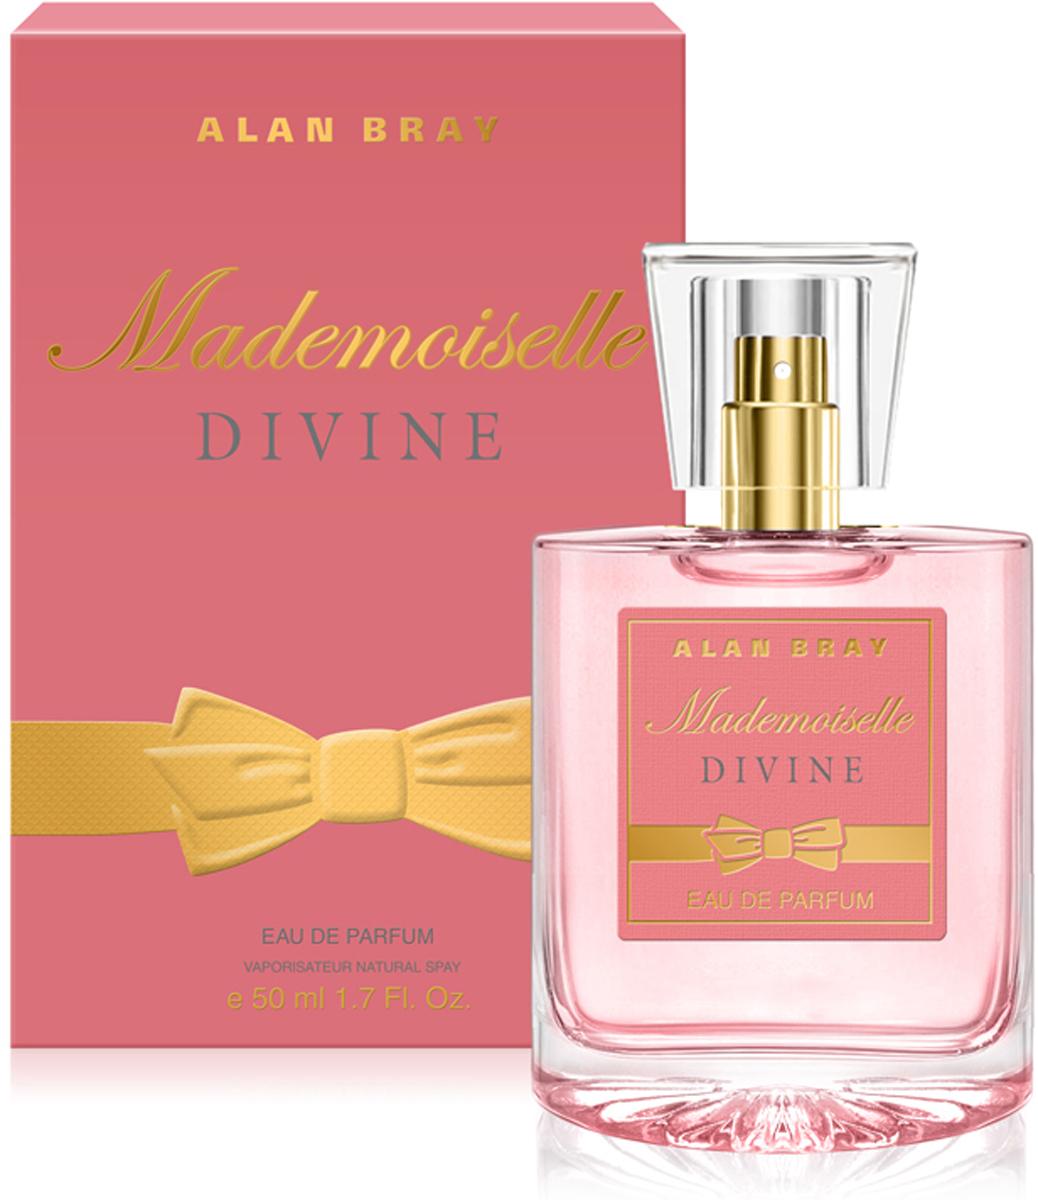 Alan Bray Парфюмерная вода Mademoiselle Divine, 50 мл alan bray paris je t aime desir парфюмированная вода 50 мл